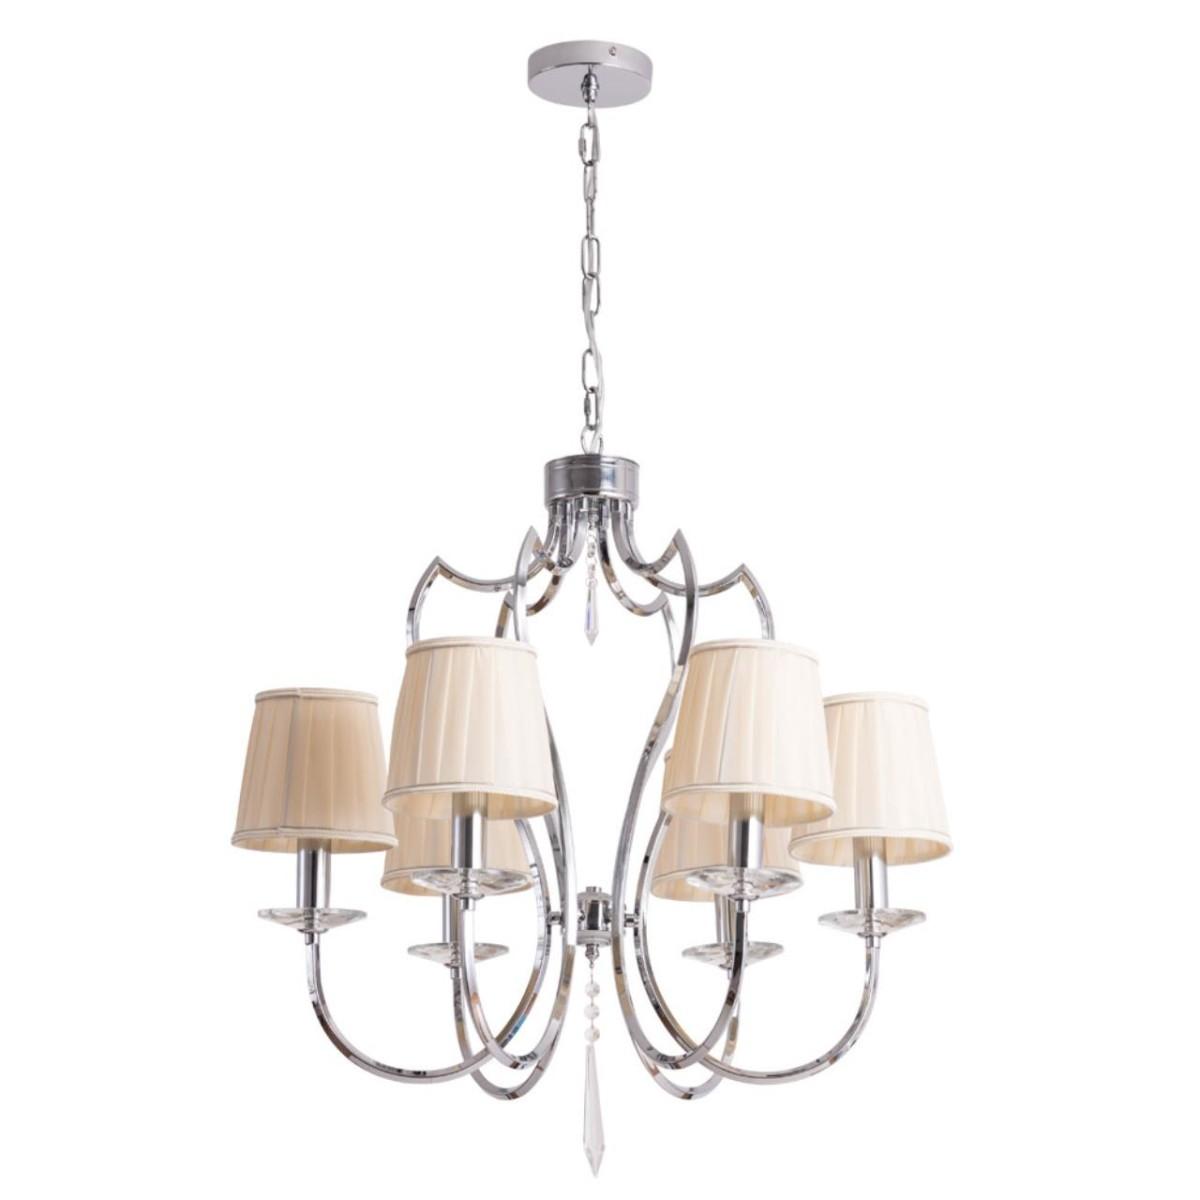 Люстра Arte Lamp Andrea A6352LM-6CC E14 6 ламп